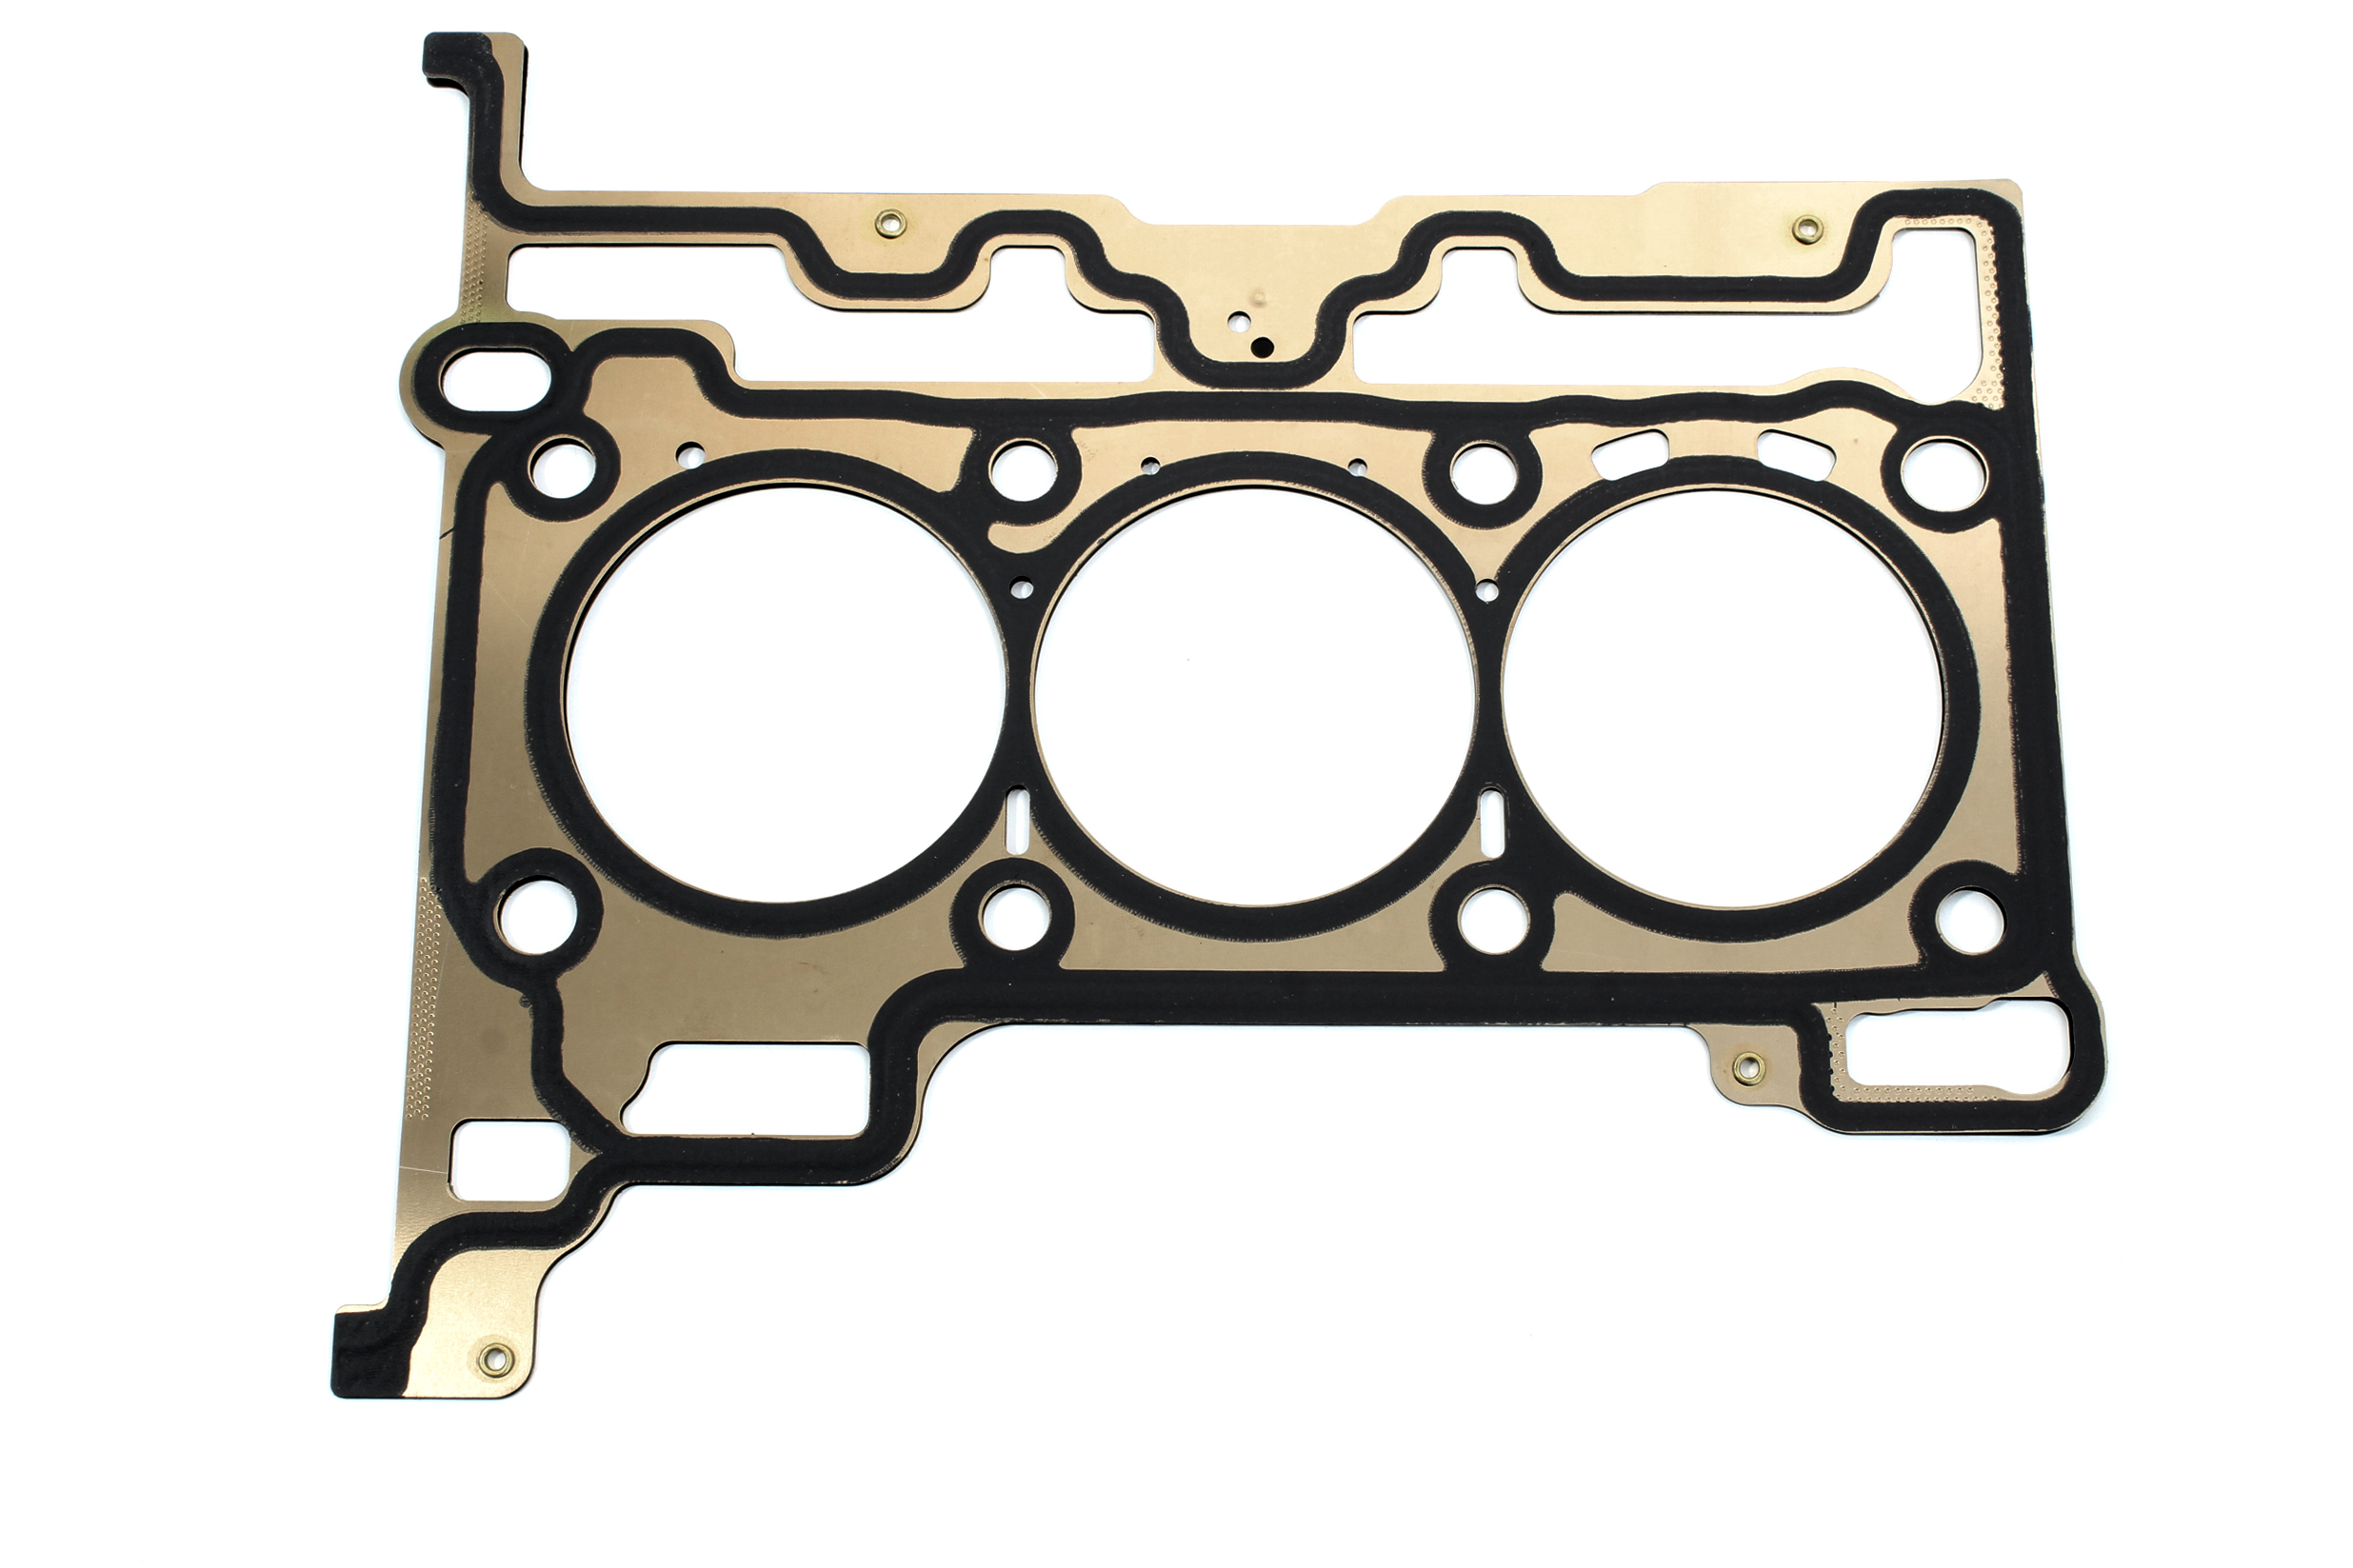 Zylinderkopfdichtung ZKD Ford B-Max 1,0 EcoBoost M1CA M1CB M1DA M1DC HG1650 NEU